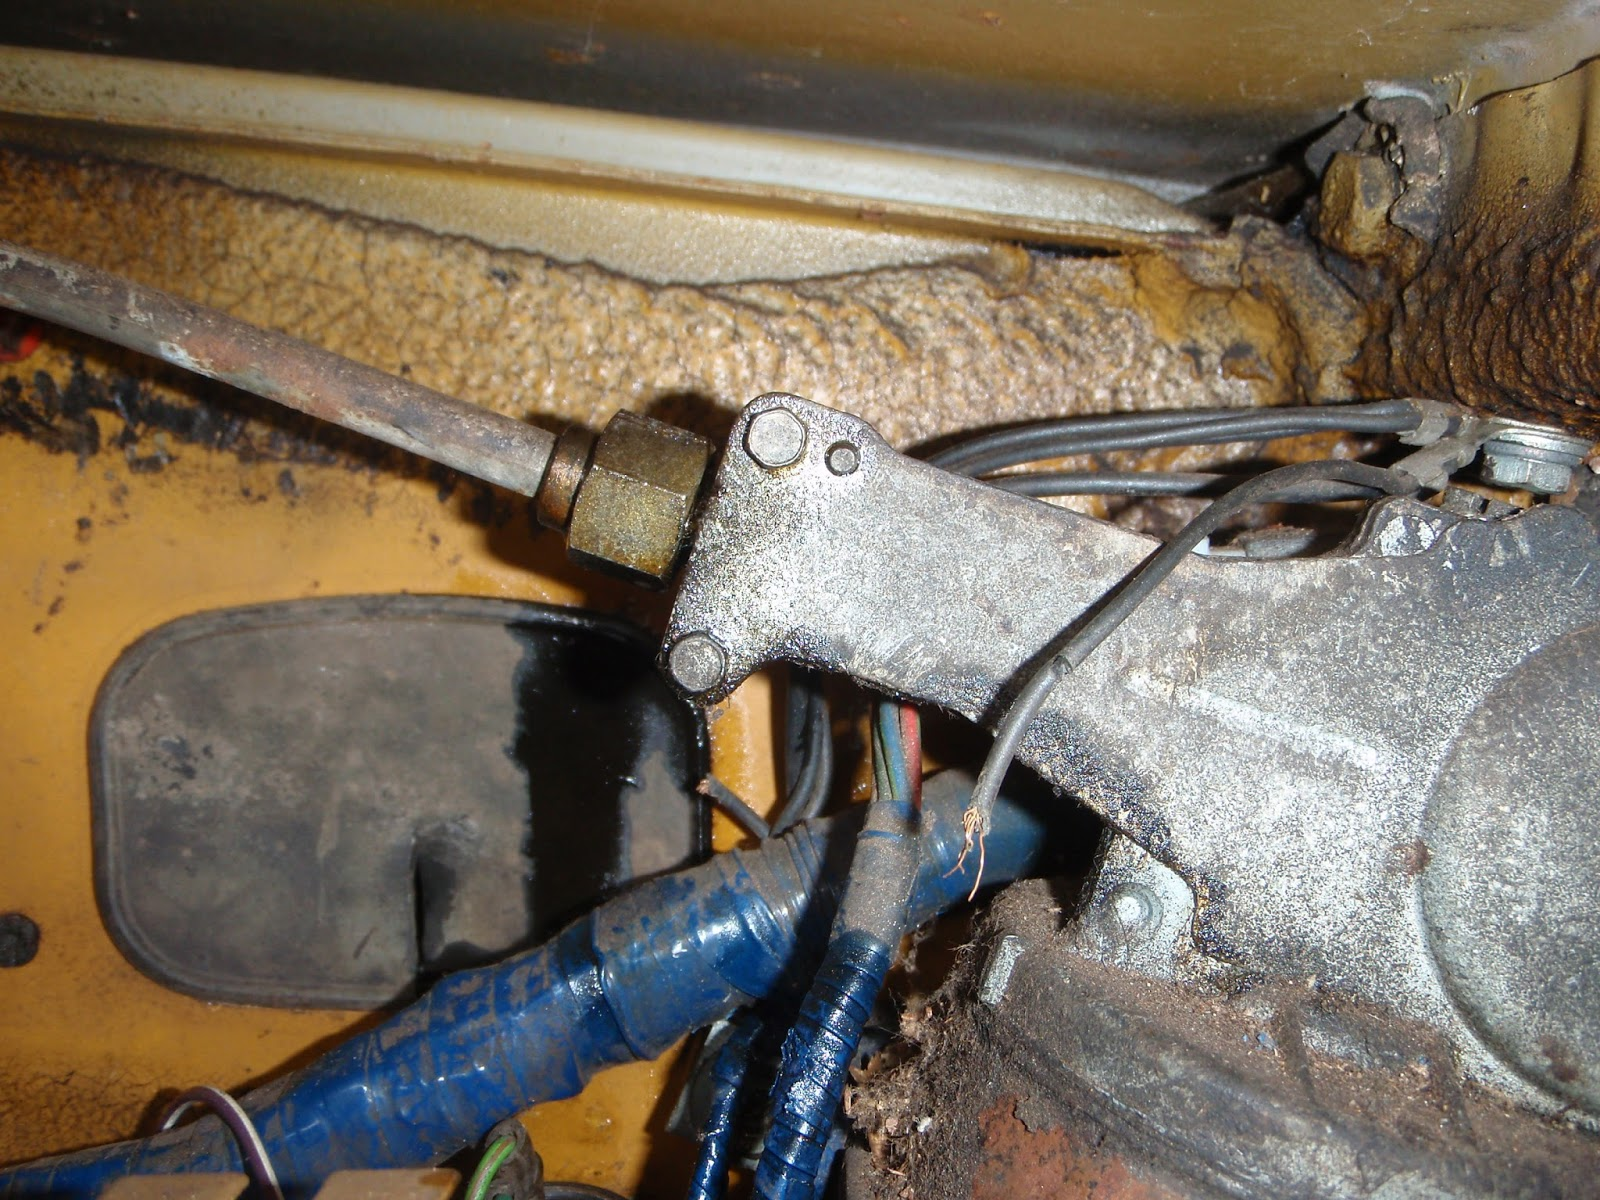 Wiring Diagram As Well Wiper Motor Wiring Diagram Besides Wiper Motor